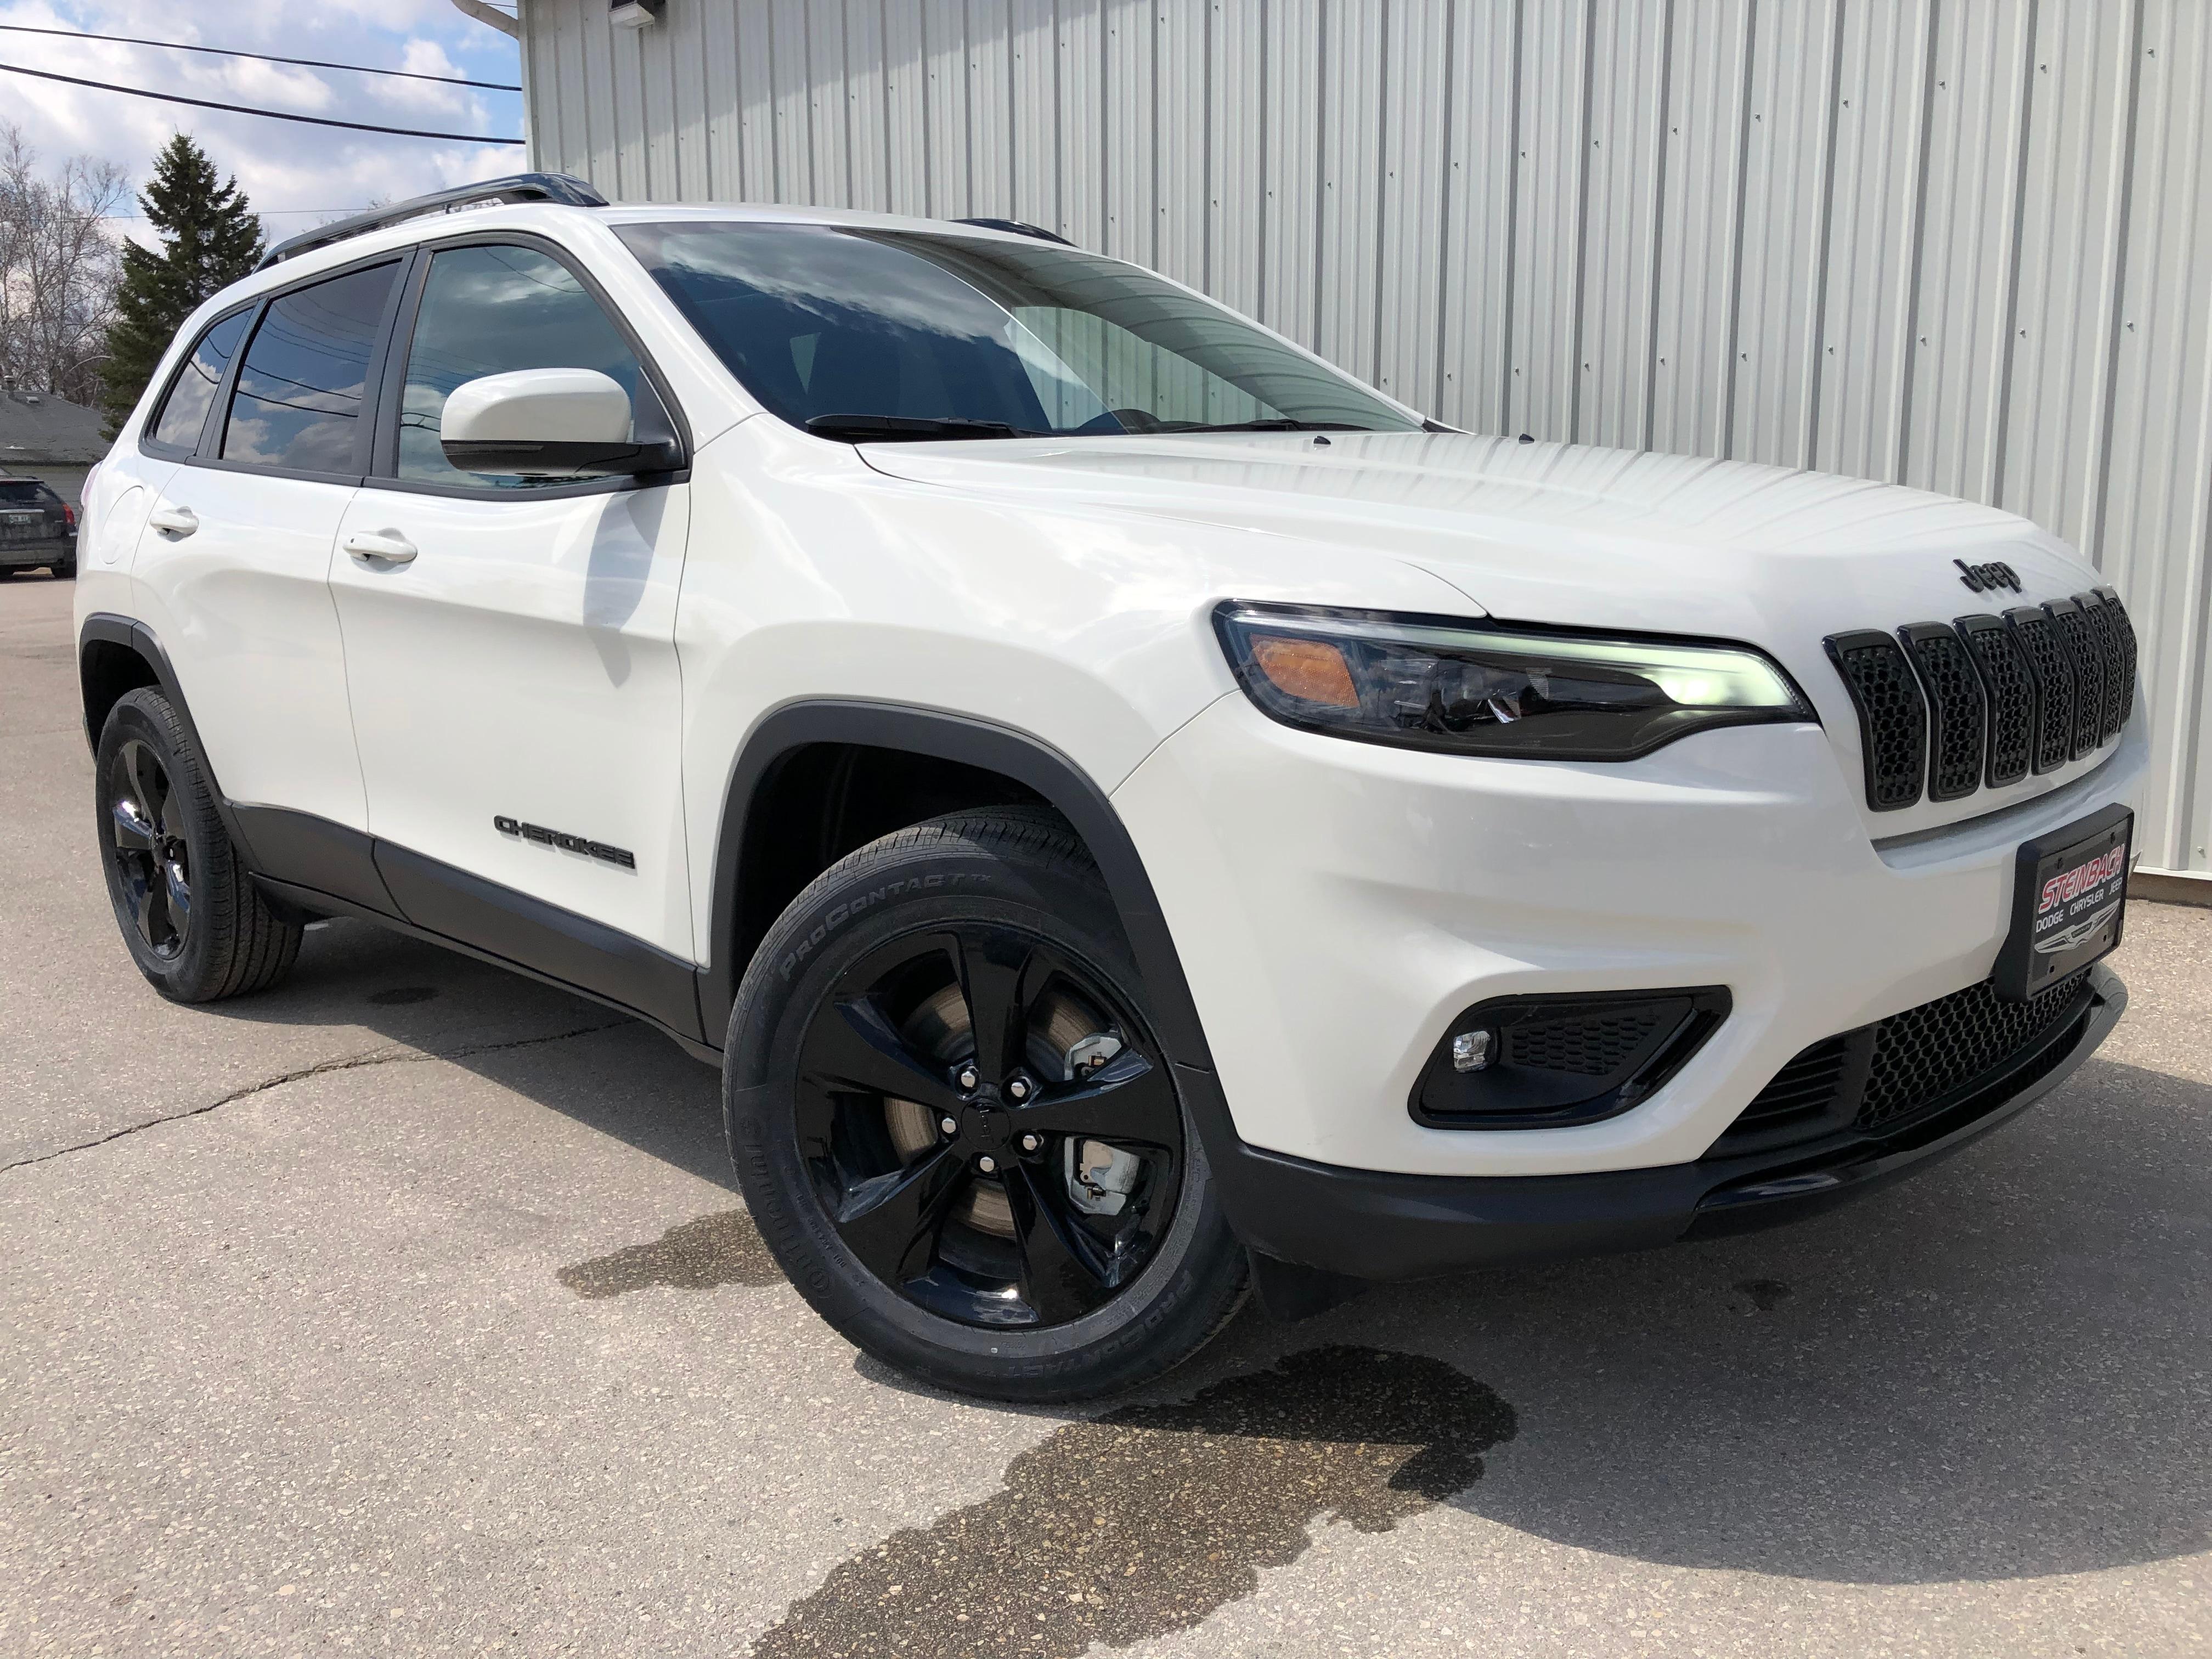 2019 Jeep New Cherokee North Heated Seats, Remote Start SUV